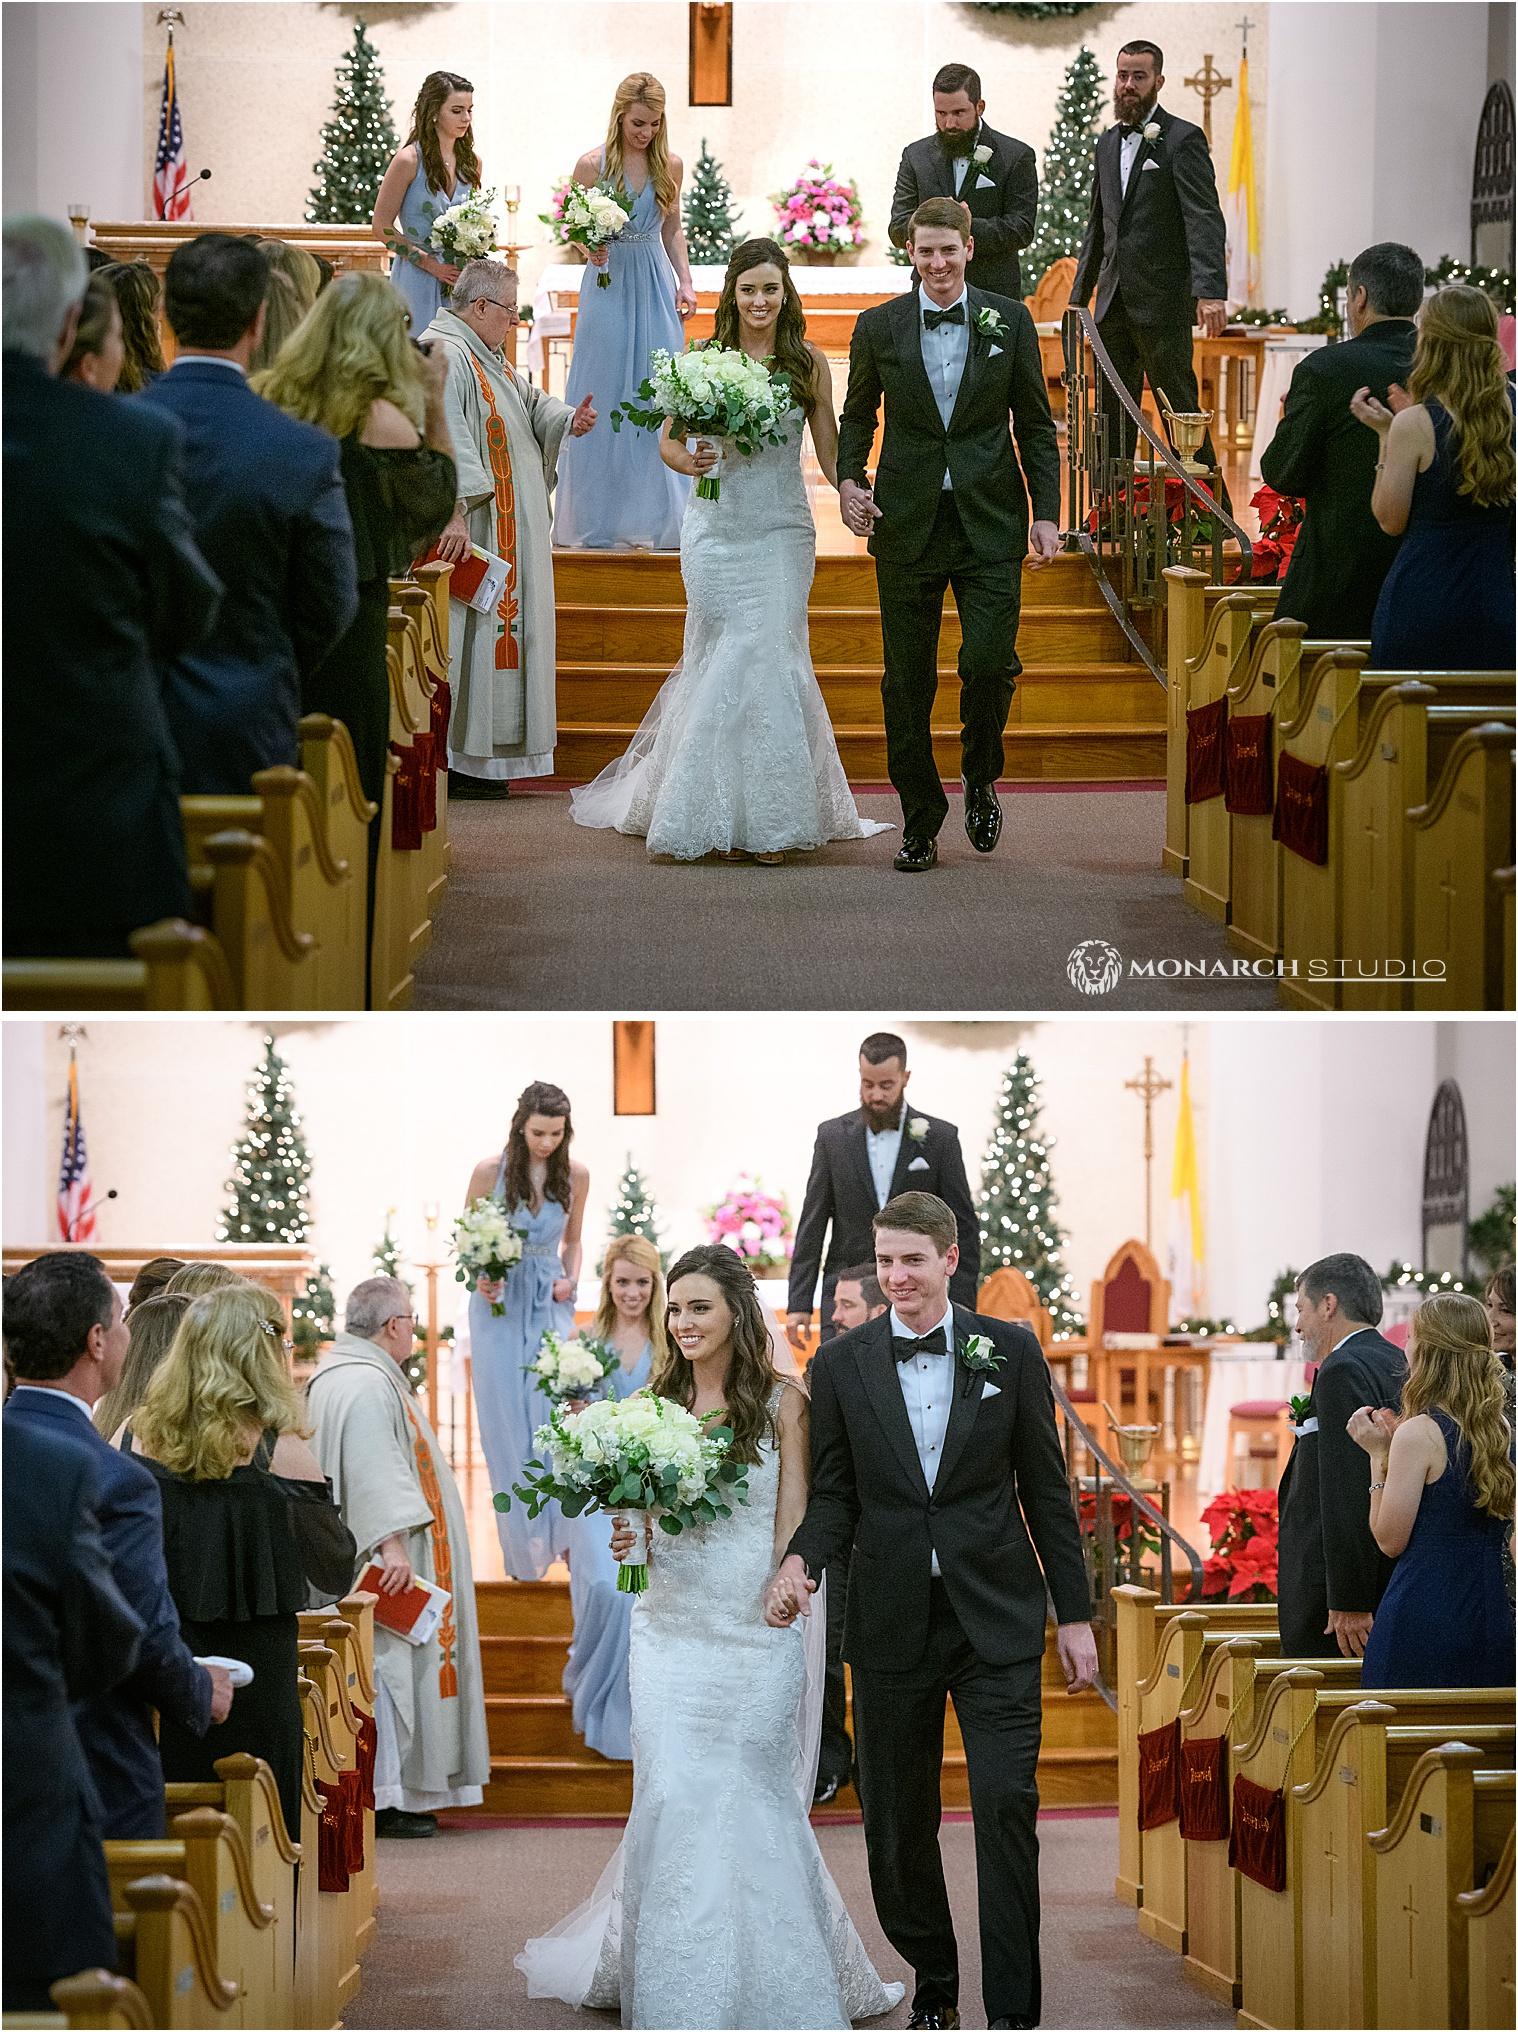 saint-augustine-wedding-photographer-treasury-053.jpg